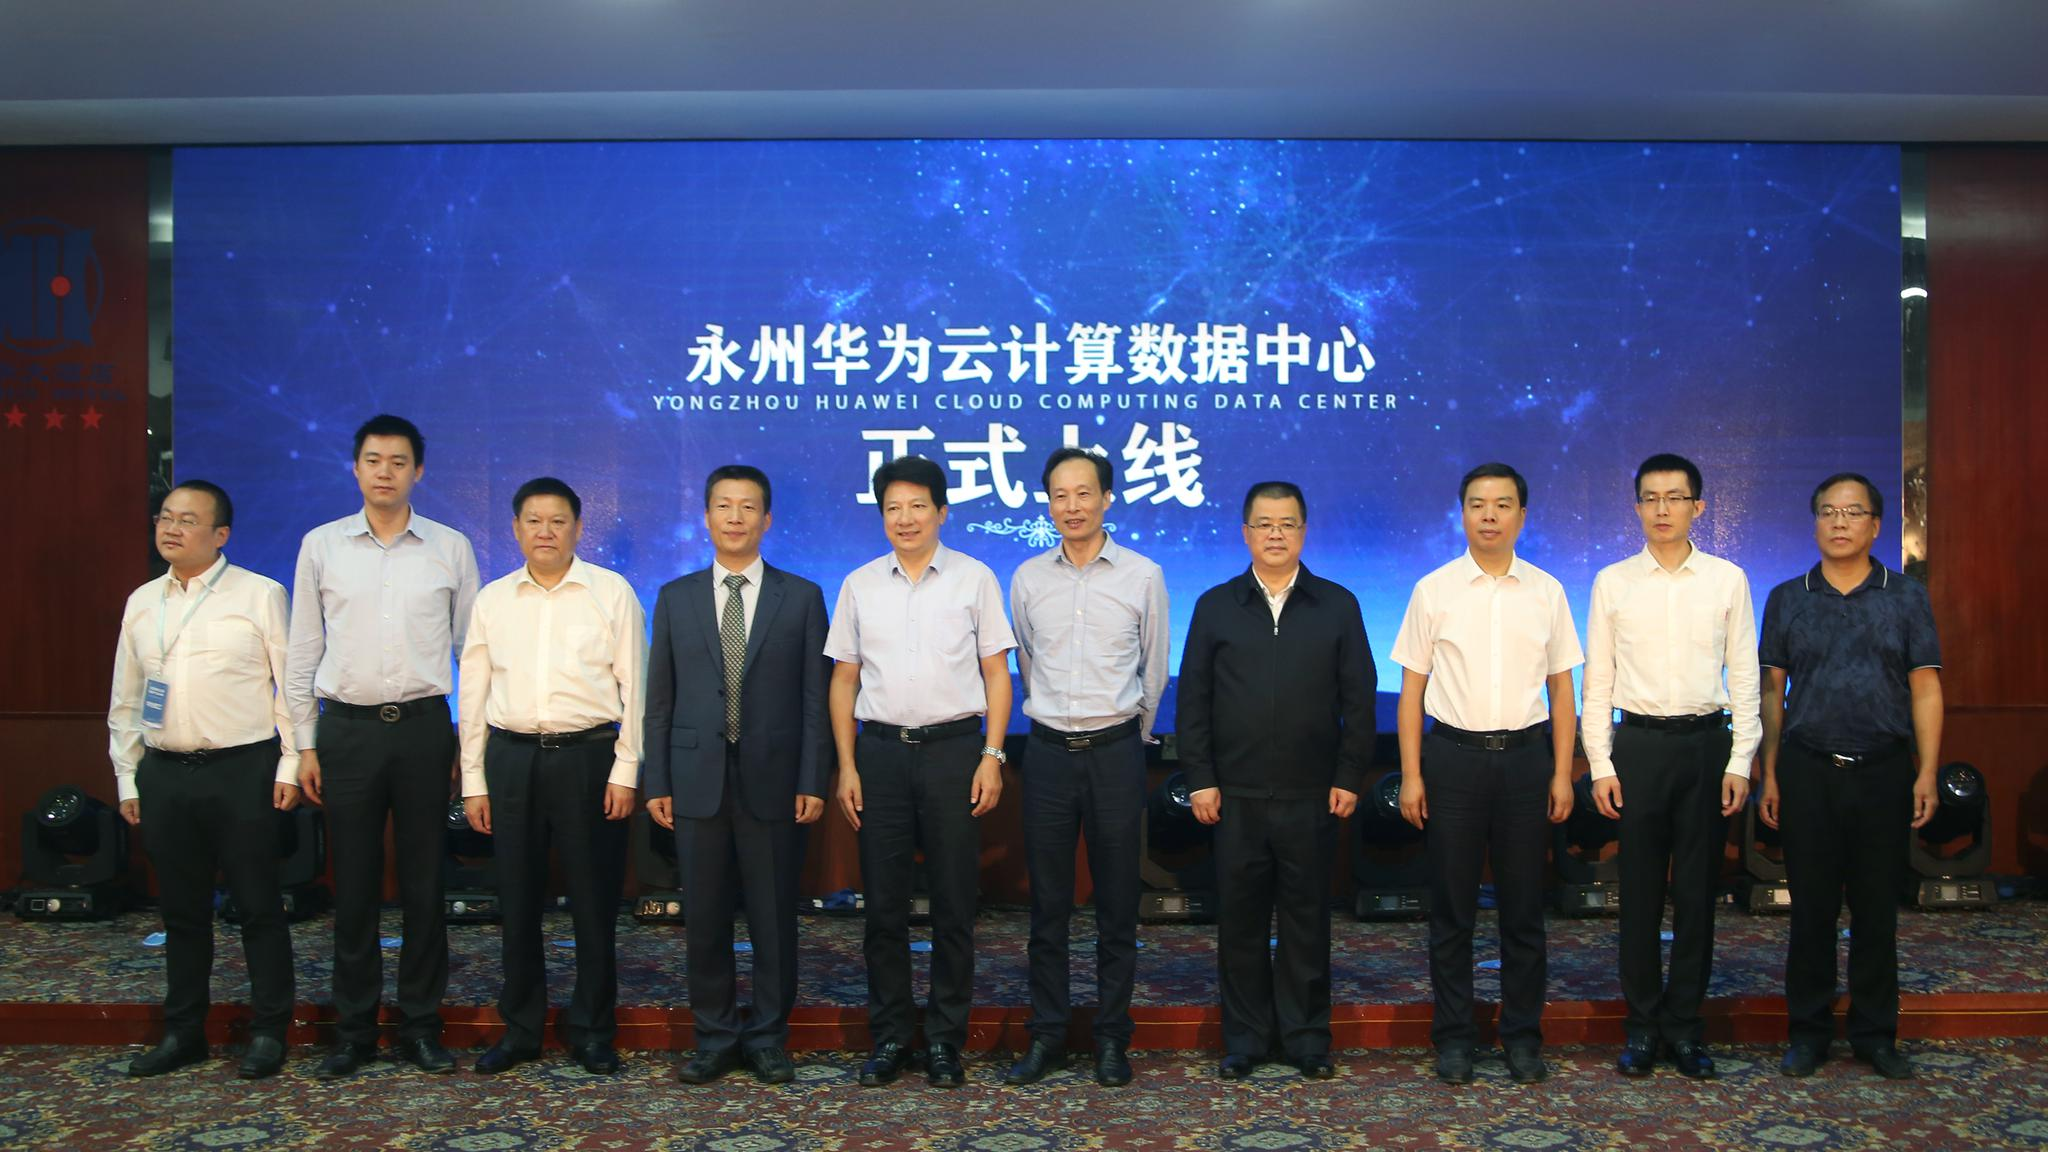 http://www.2ku8.net/caijingfenxi/67977.html